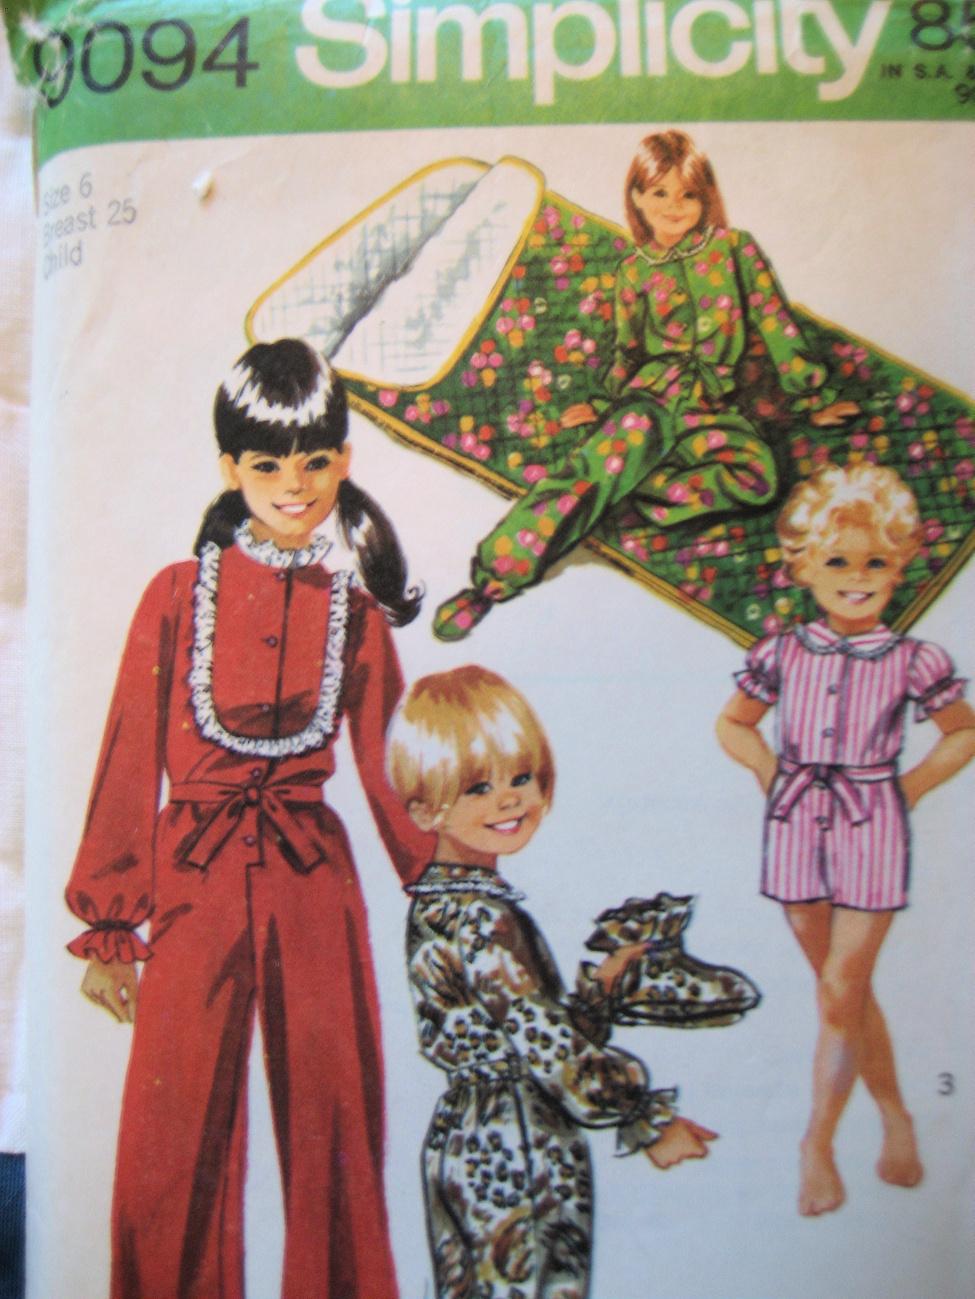 Vintage Sewing 70s Girls Size 6 PJs Sleeping Bag S90944 Simplicity New Look